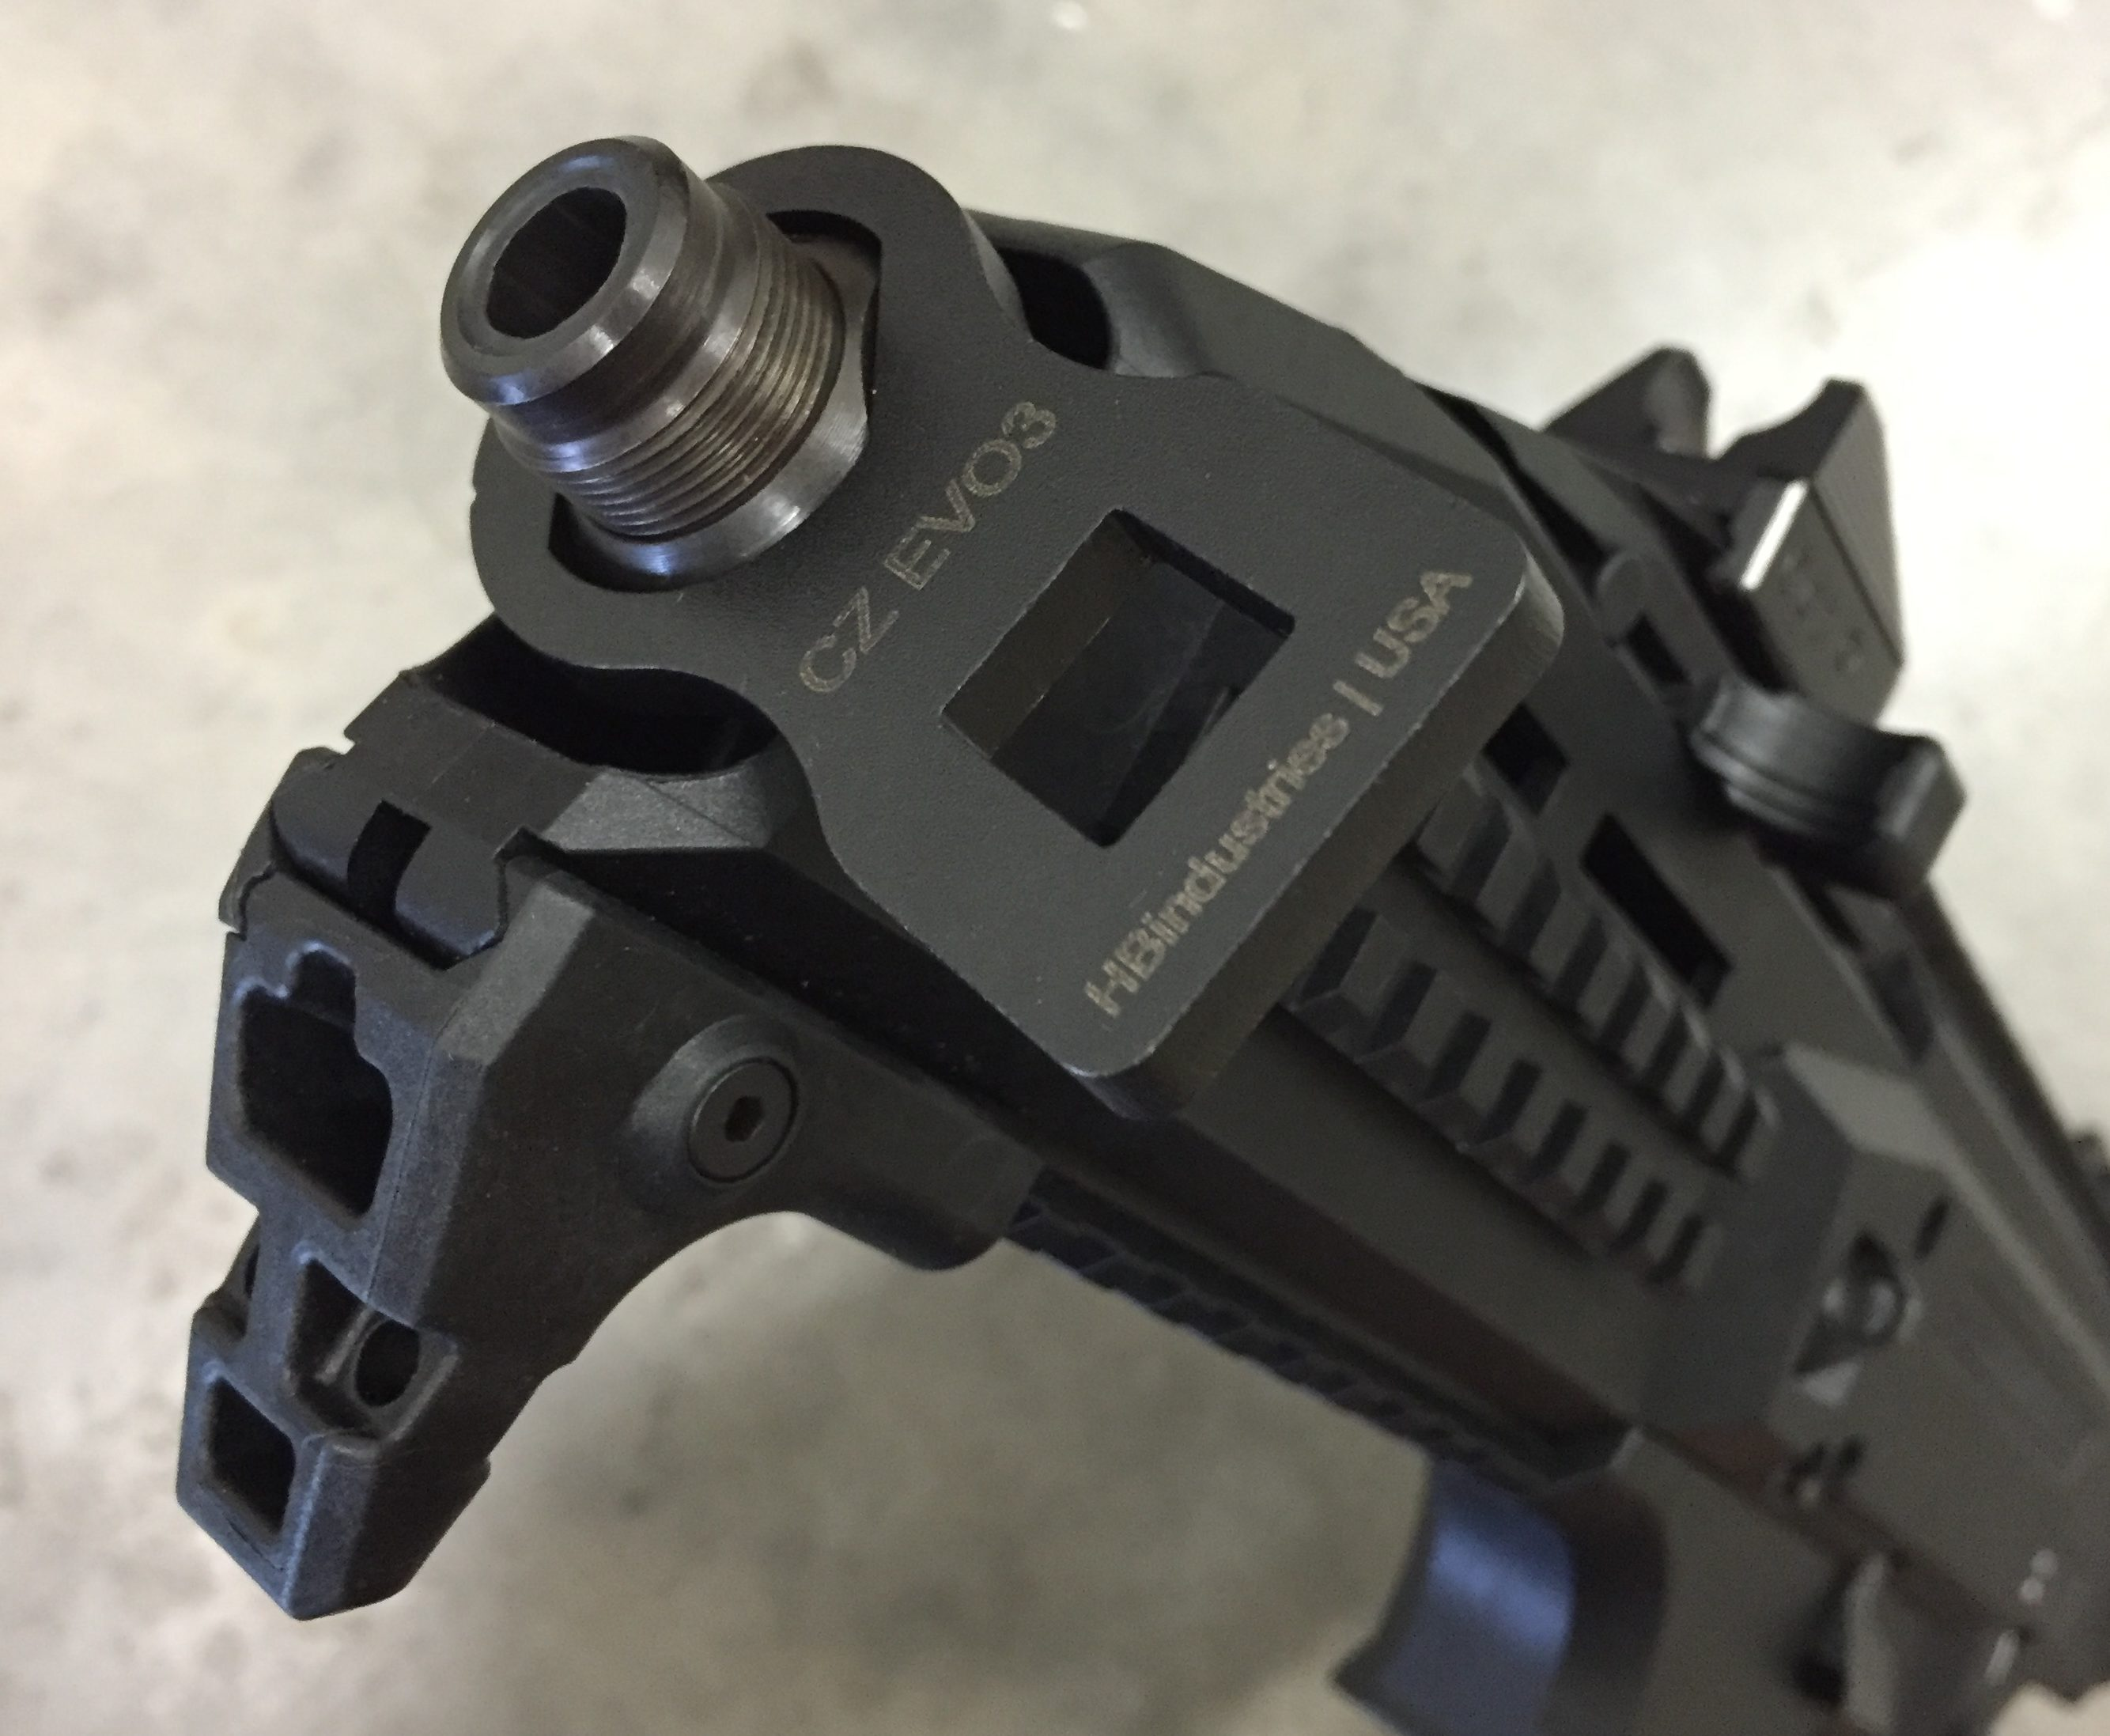 CZ Scorpion Barrel Nut Wrench Tool HBI